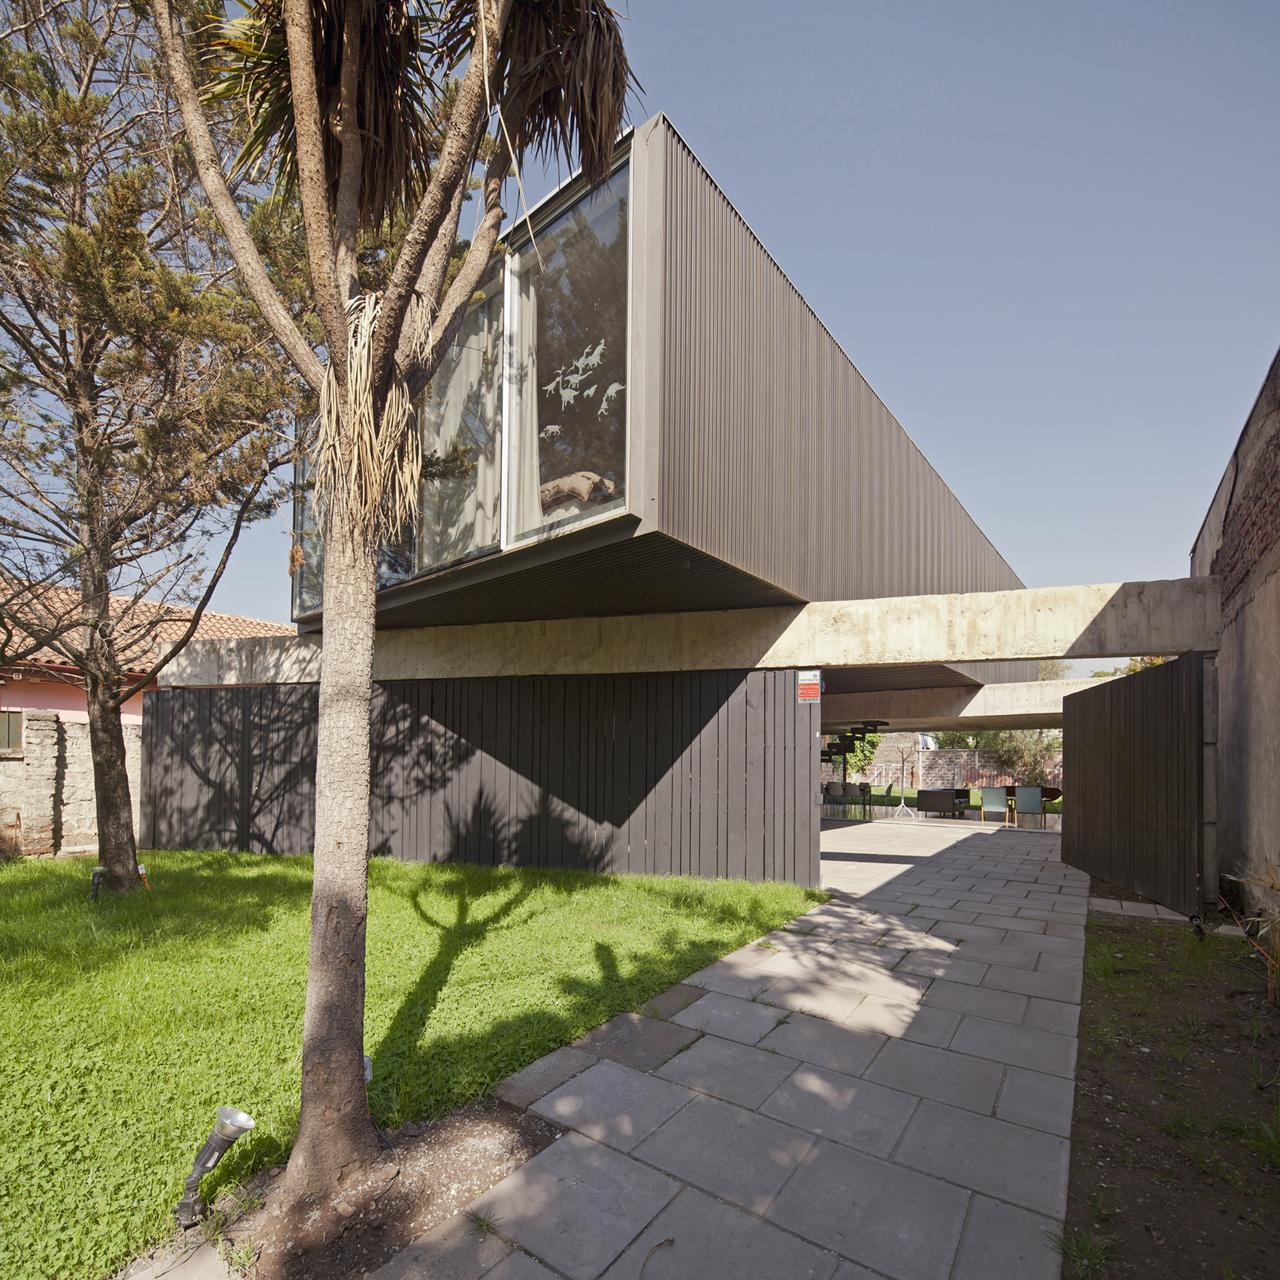 Casa Un Patio / POLIDURA + TALHOUK ARQUITECTOS, Cortesia de POLIDURA + TALHOUK ARQUITECTOS